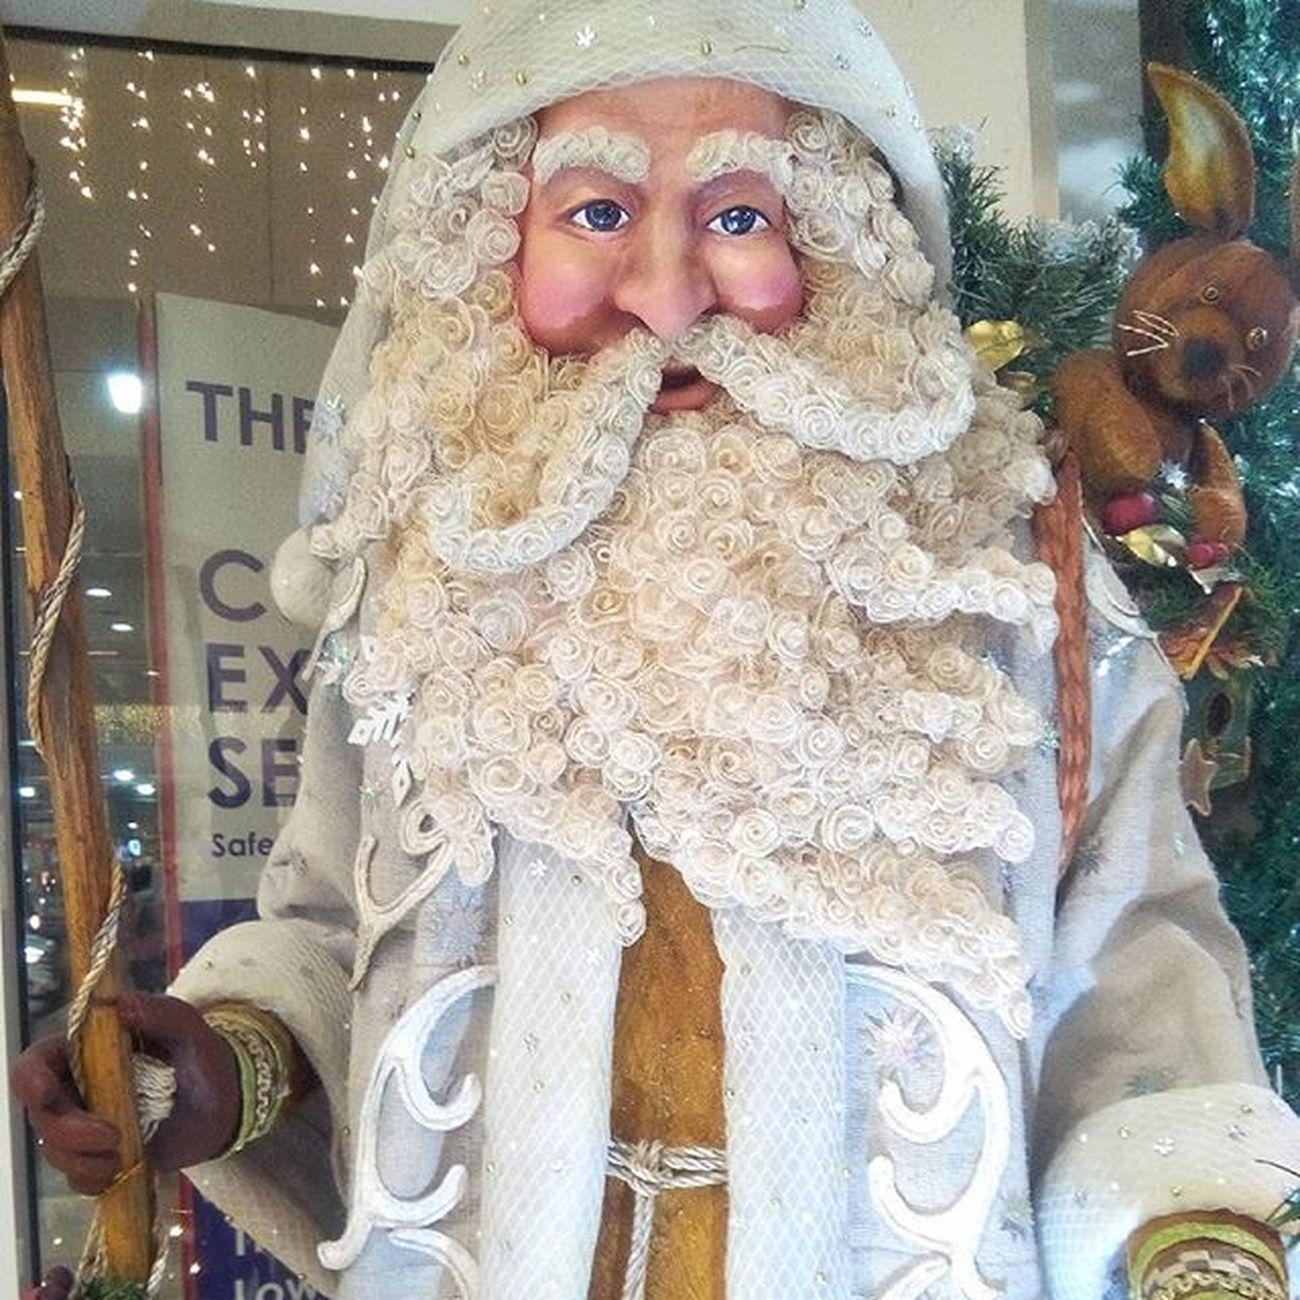 Meet Uncle Santa © G MANZANILLA PHOTOGRAPHY — Philippines Scenery Christmas Asian  World Travel Tours Tourist Photography Snow White Santa Claus Lights Wonderful Glmanzanilla Holiday WOW